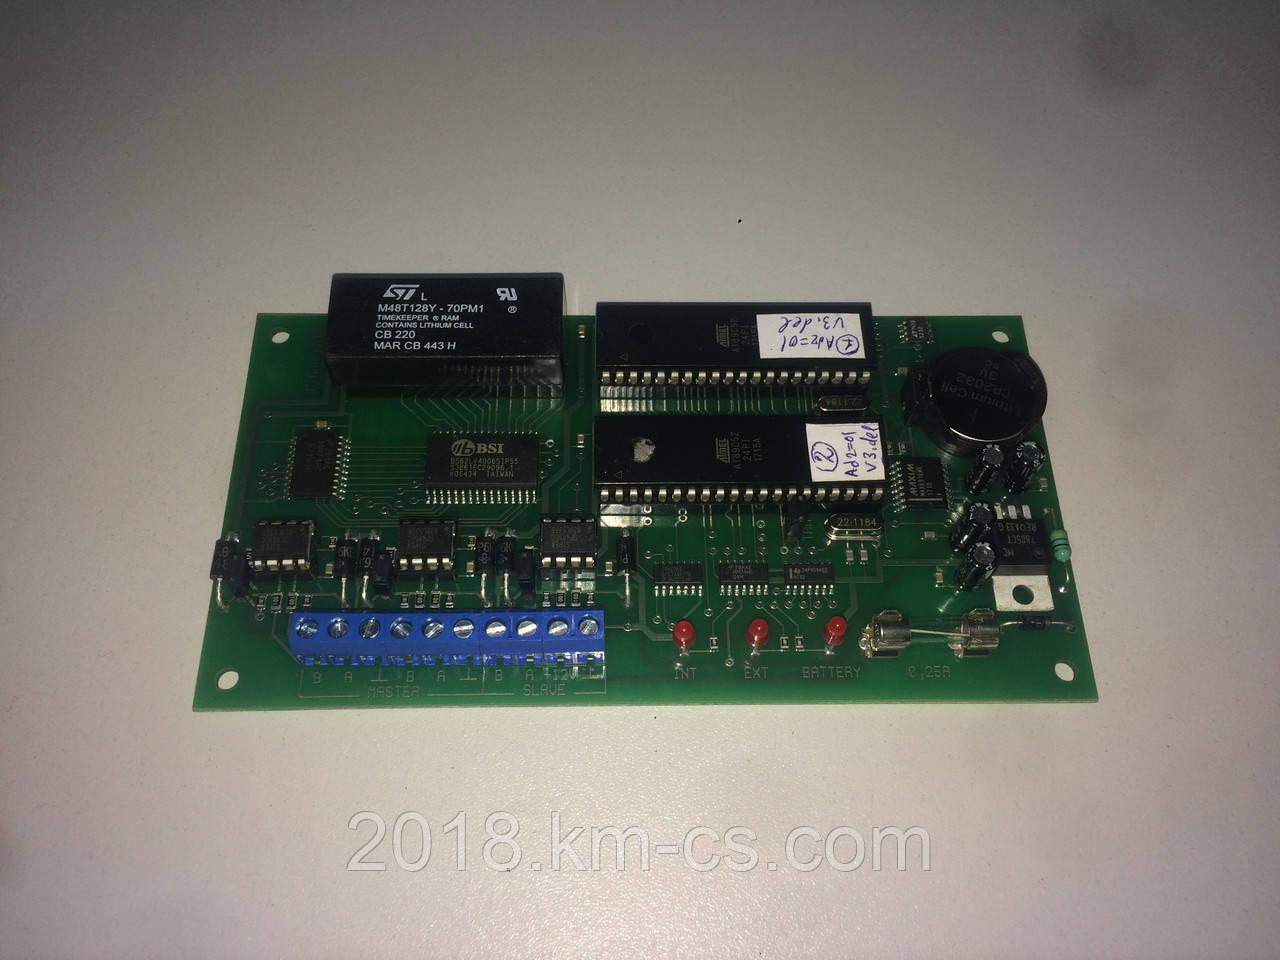 Контроллер-диспетчер Д-256